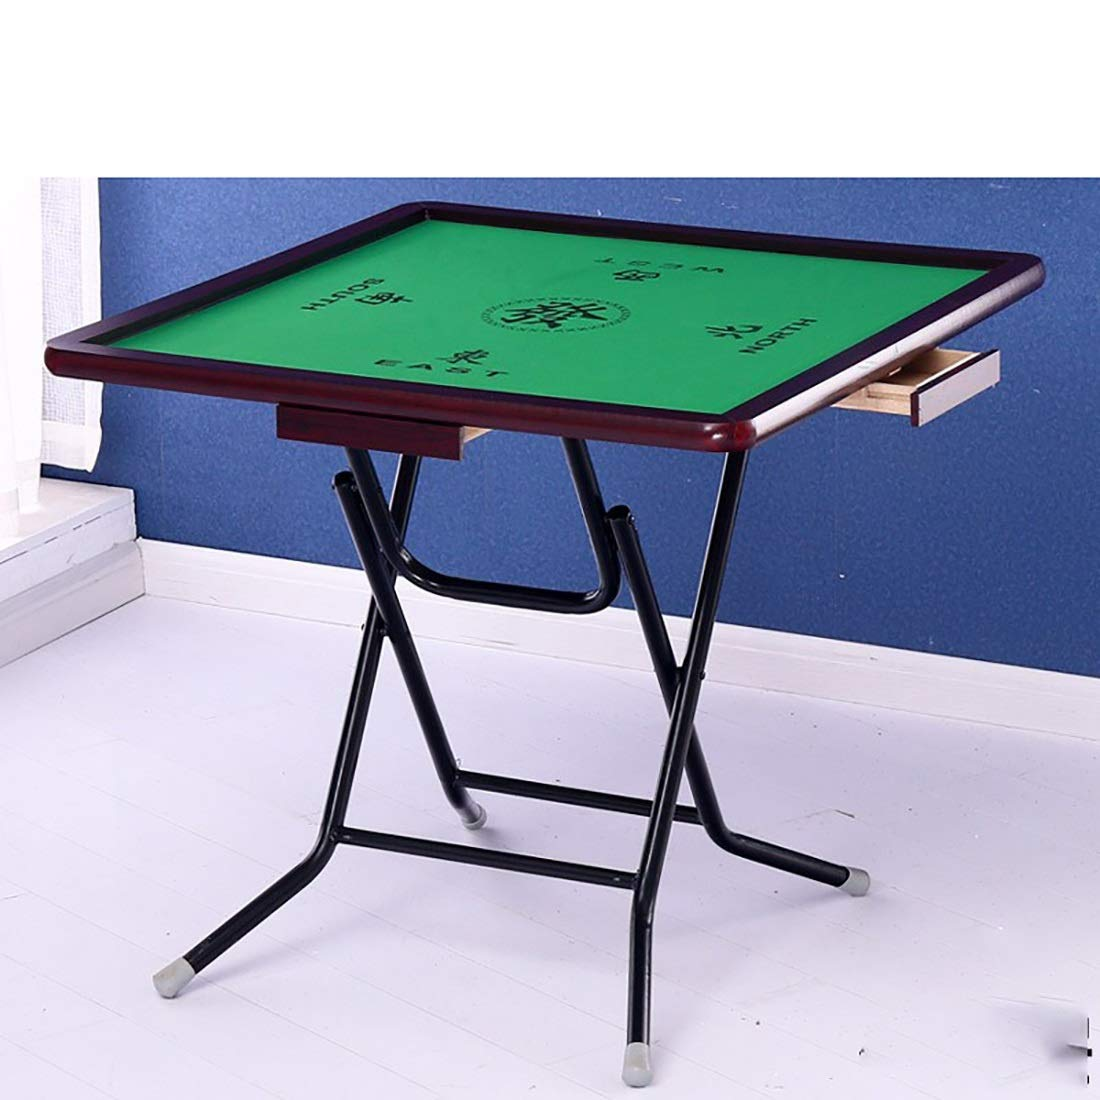 85cm walnut wood side 1 NuoEn Mahjong Table,Poker, Card Games, Board Games, Tile Games,Dominoes,Poker Table Wooden